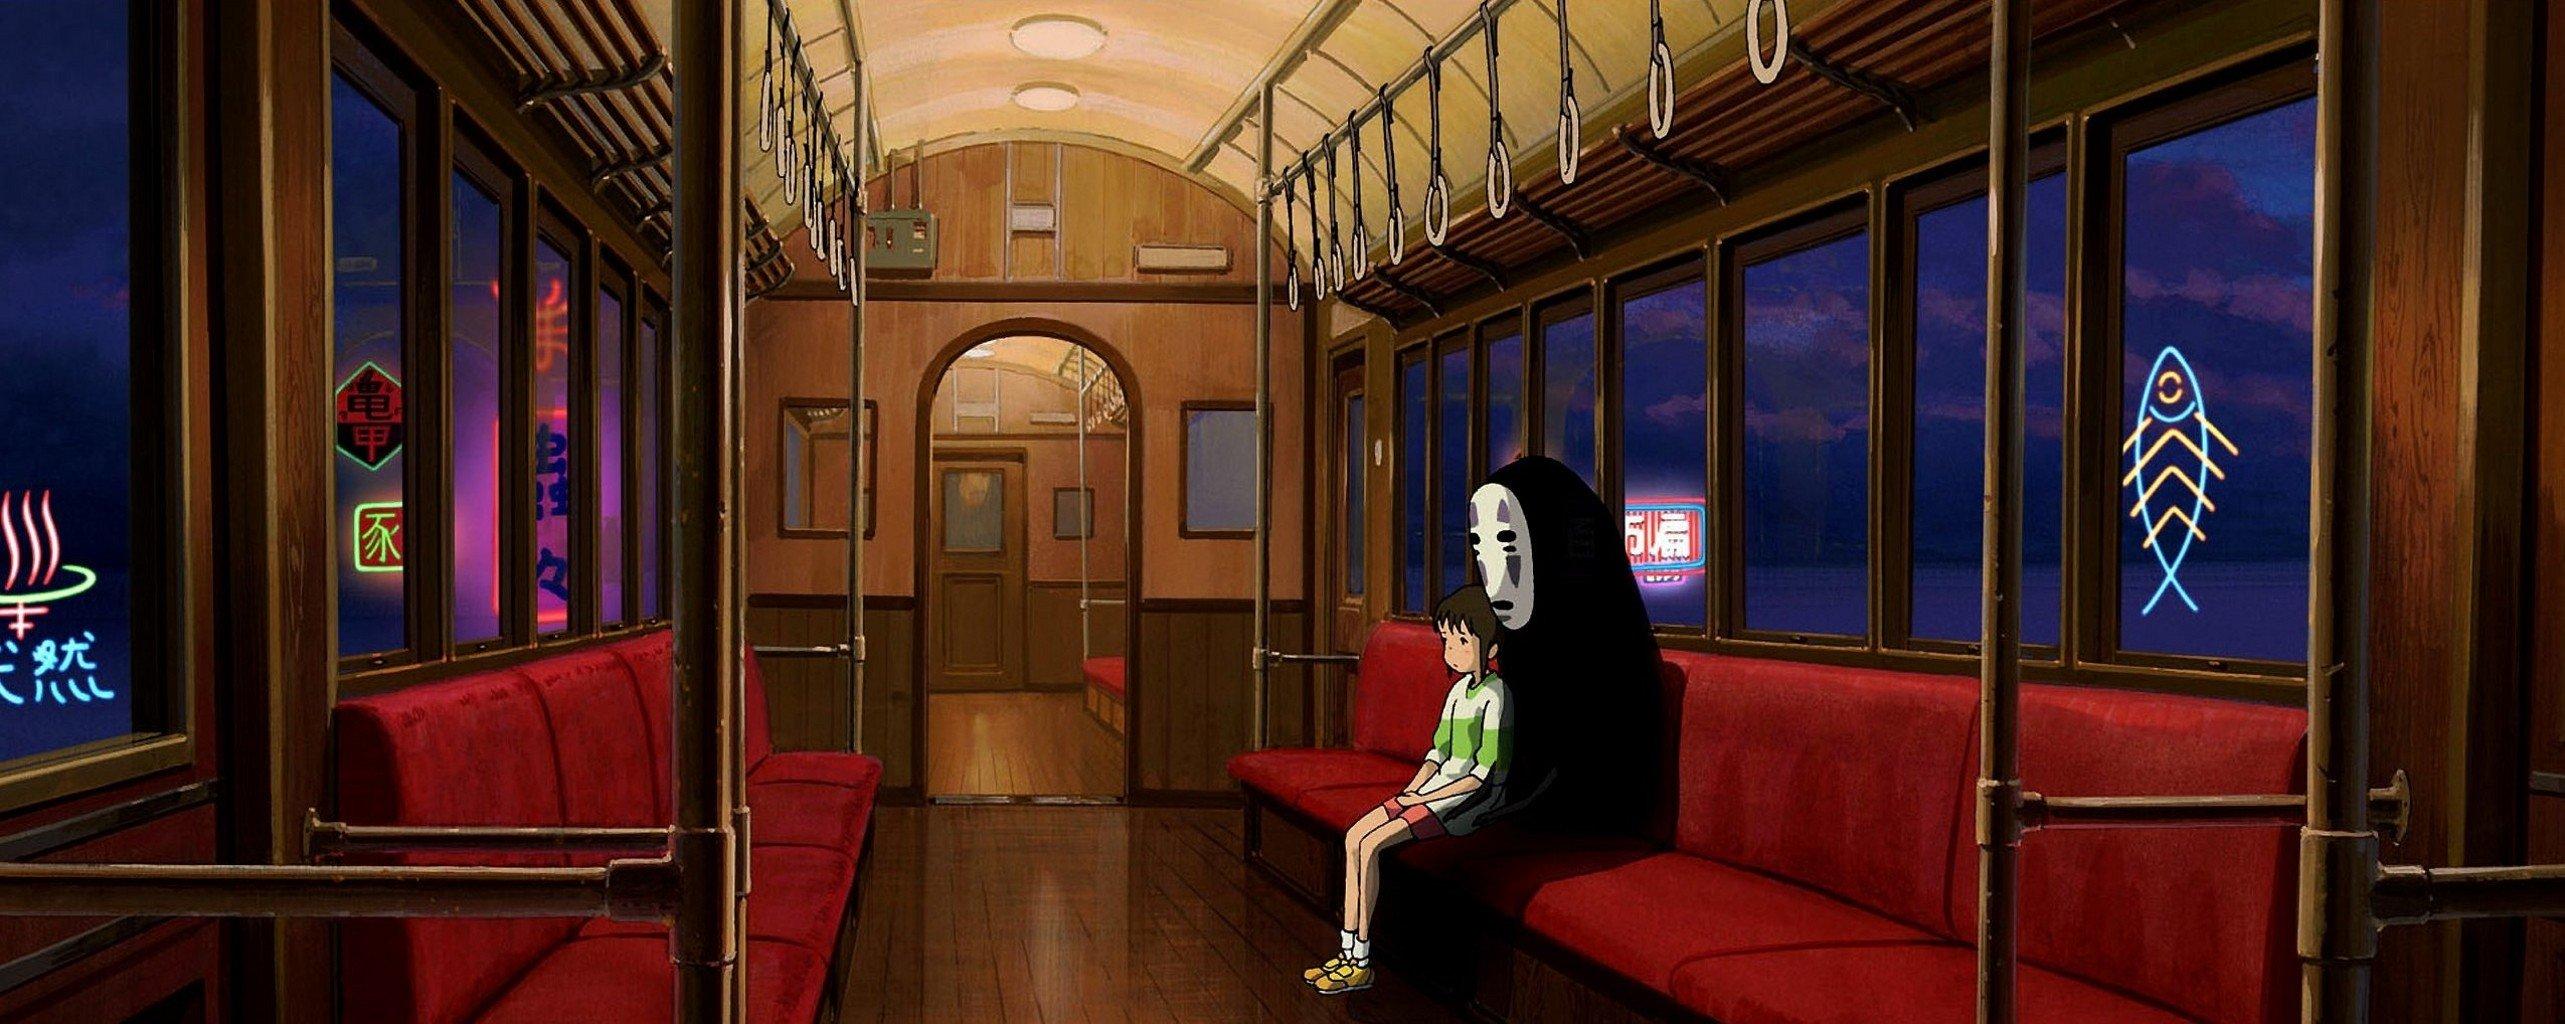 Anime Wallpaper 2014 Hayao Miyazaki Spirited Away Studio Ghibli Wallpaper